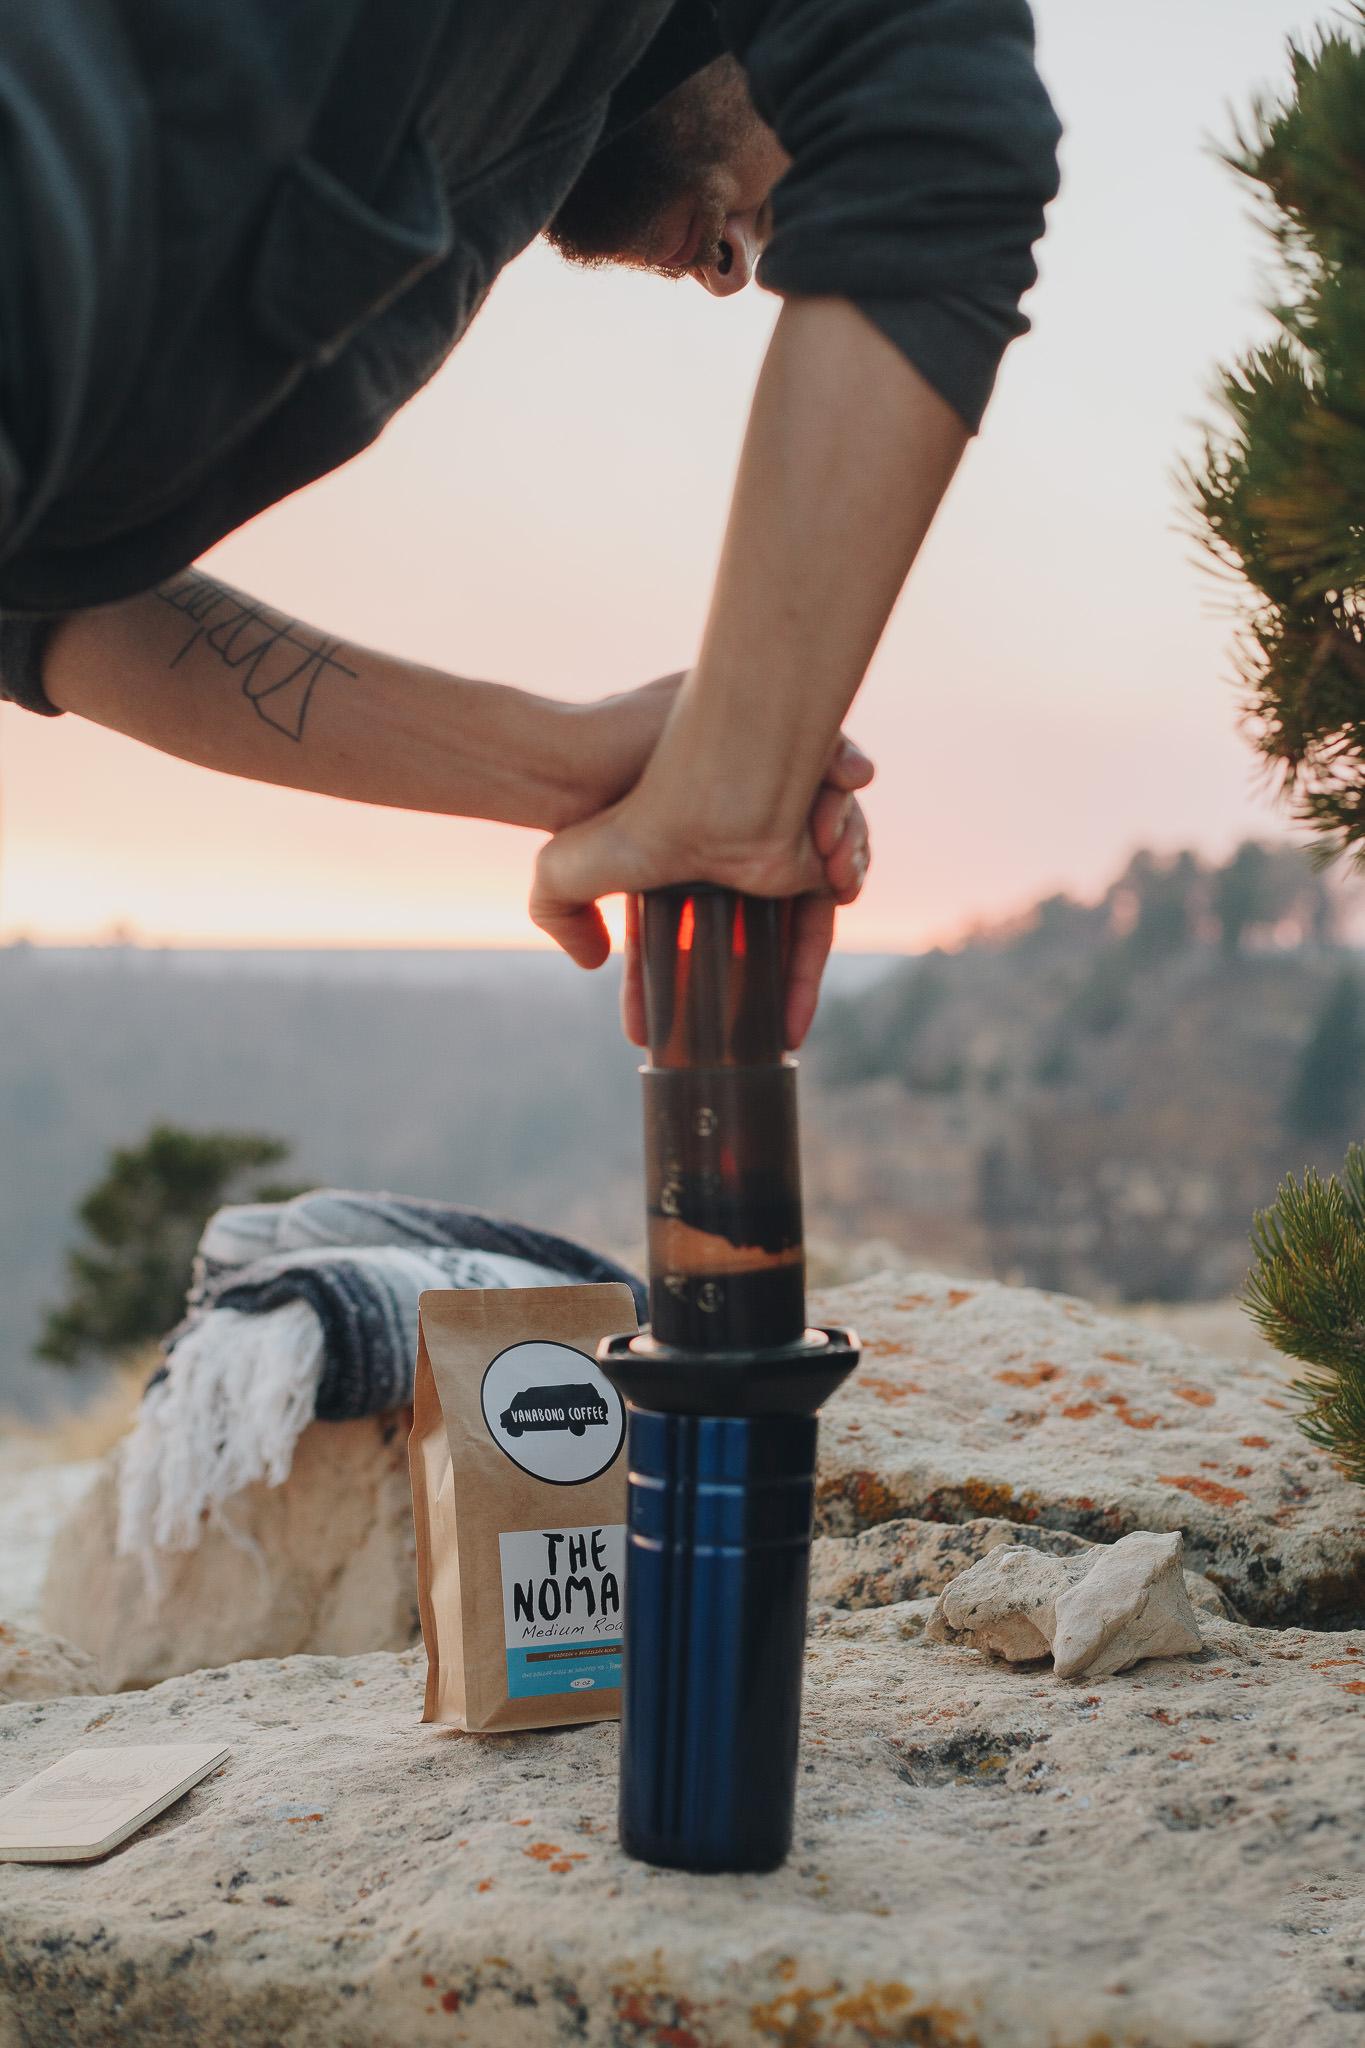 Pressing Aeropress coffee